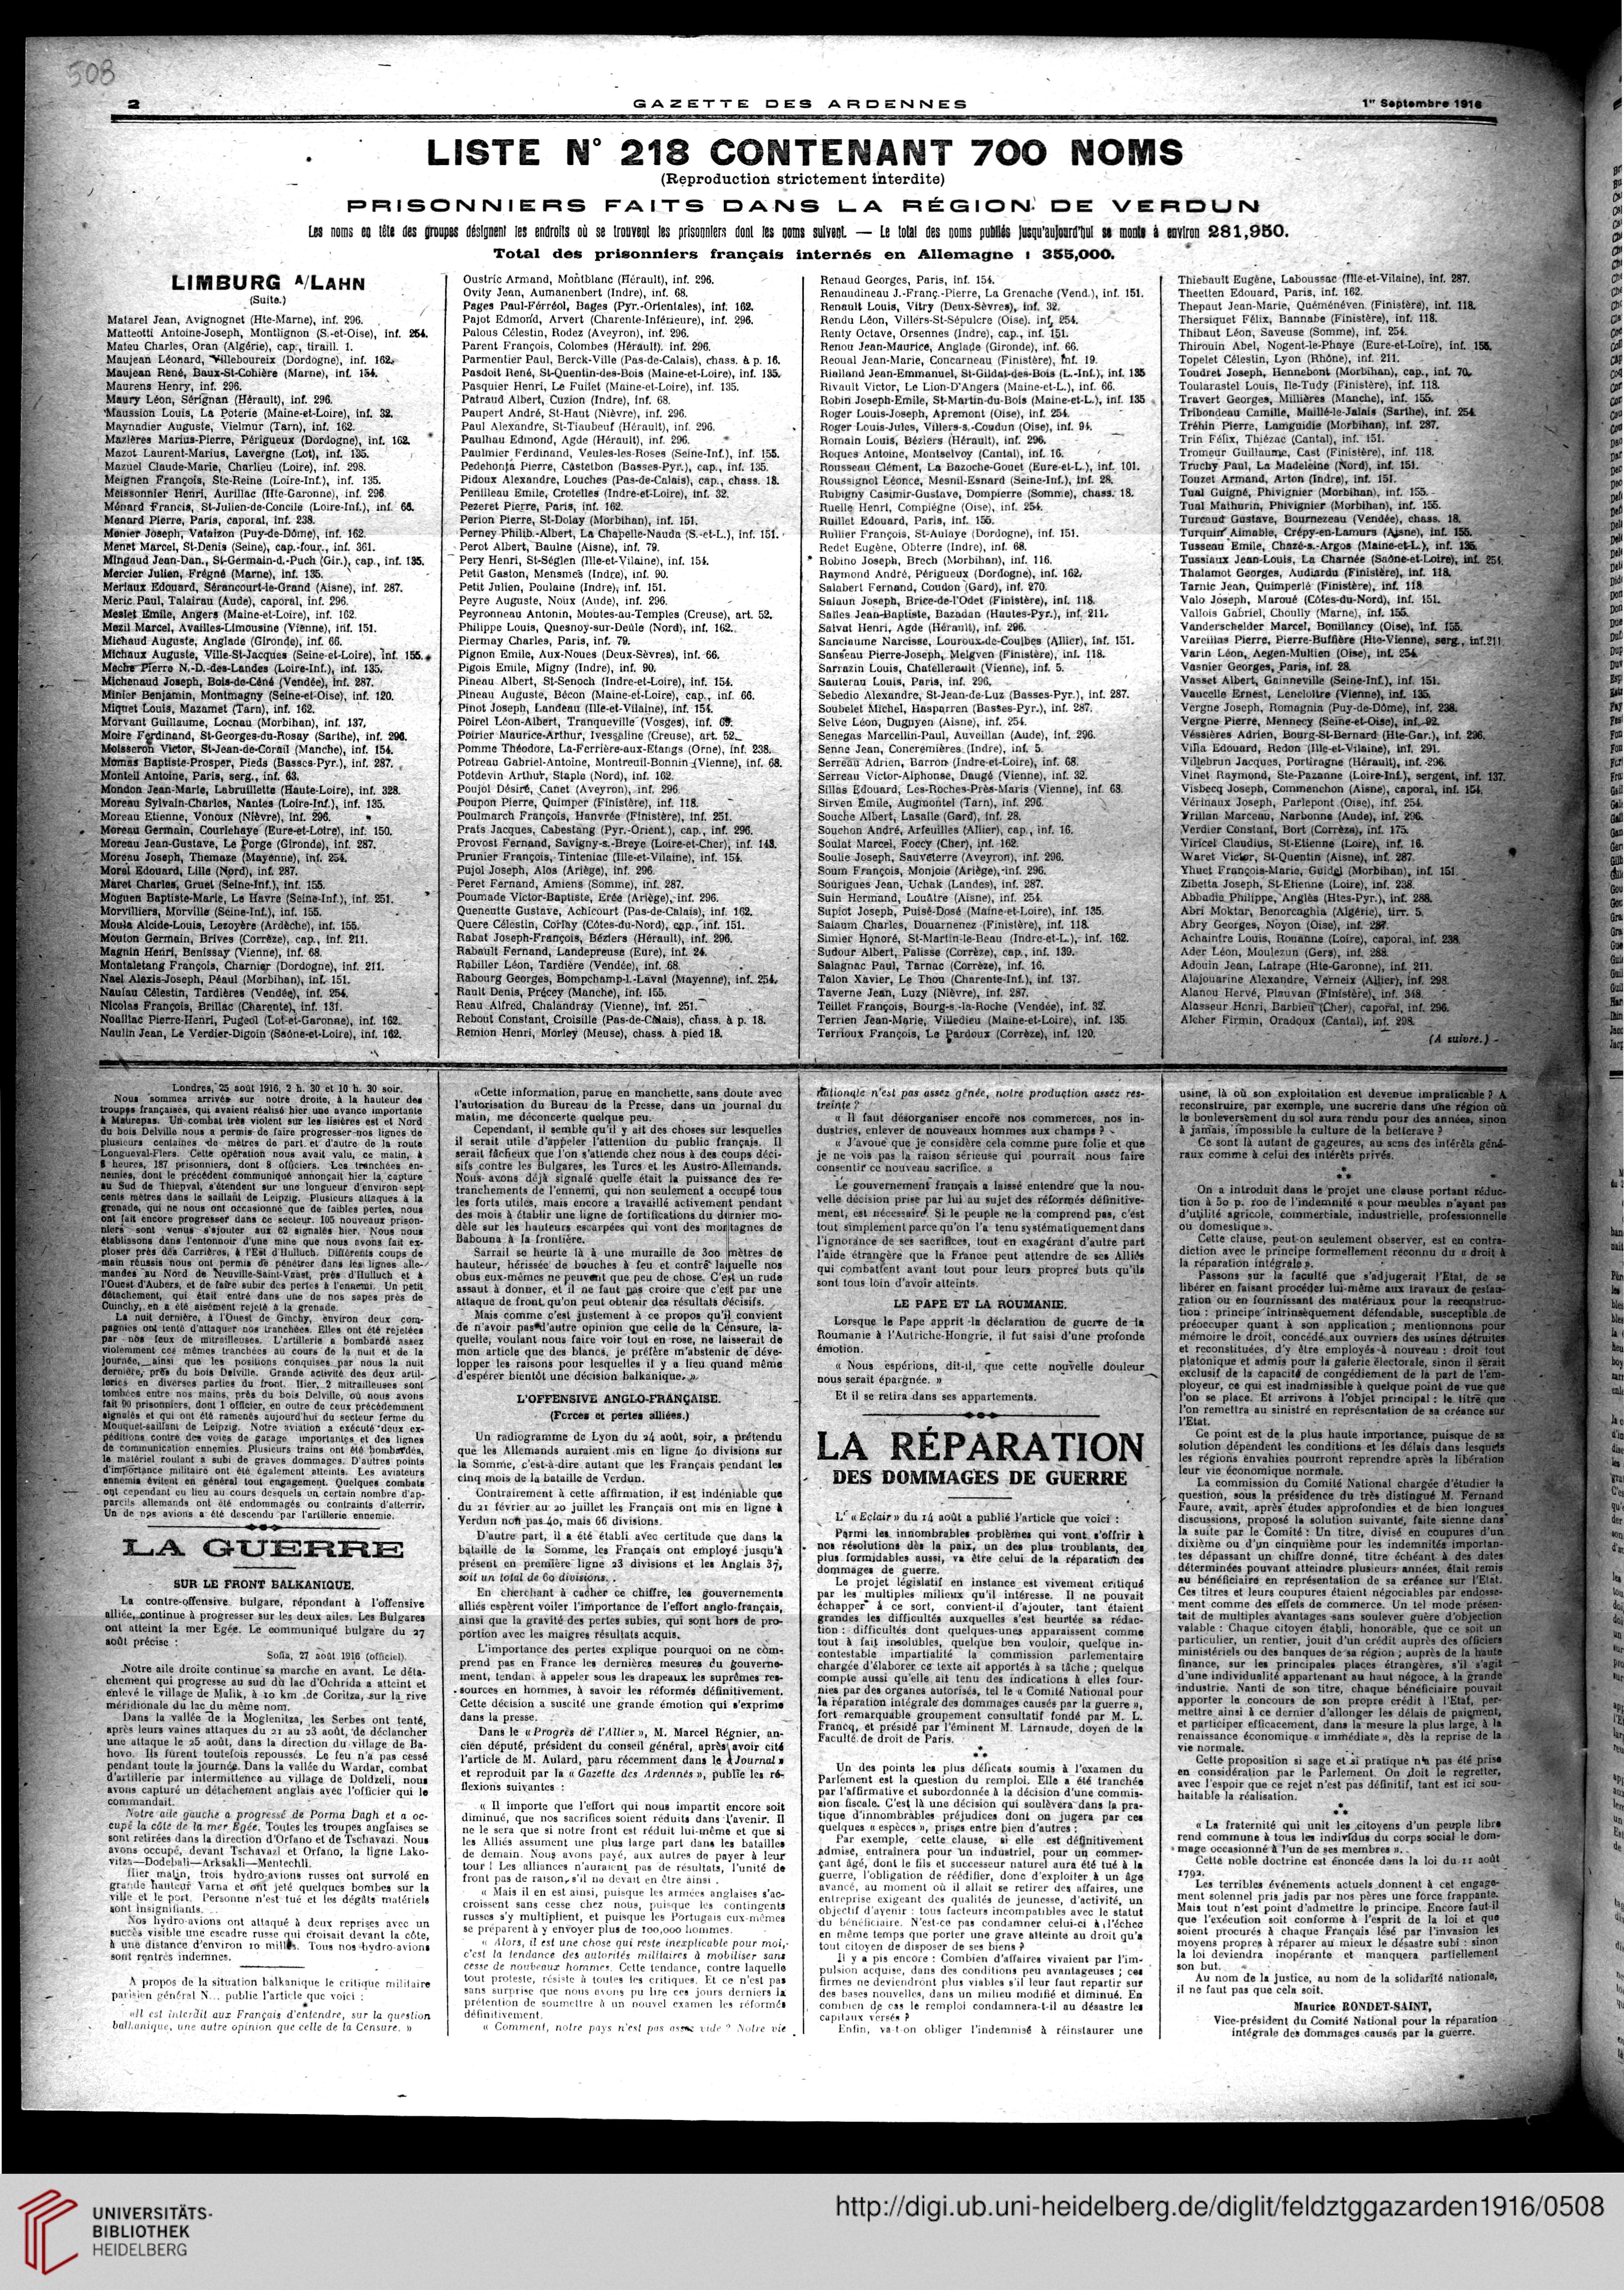 Gazette Des Ardennes Journal Pays Occupes Januar 1916